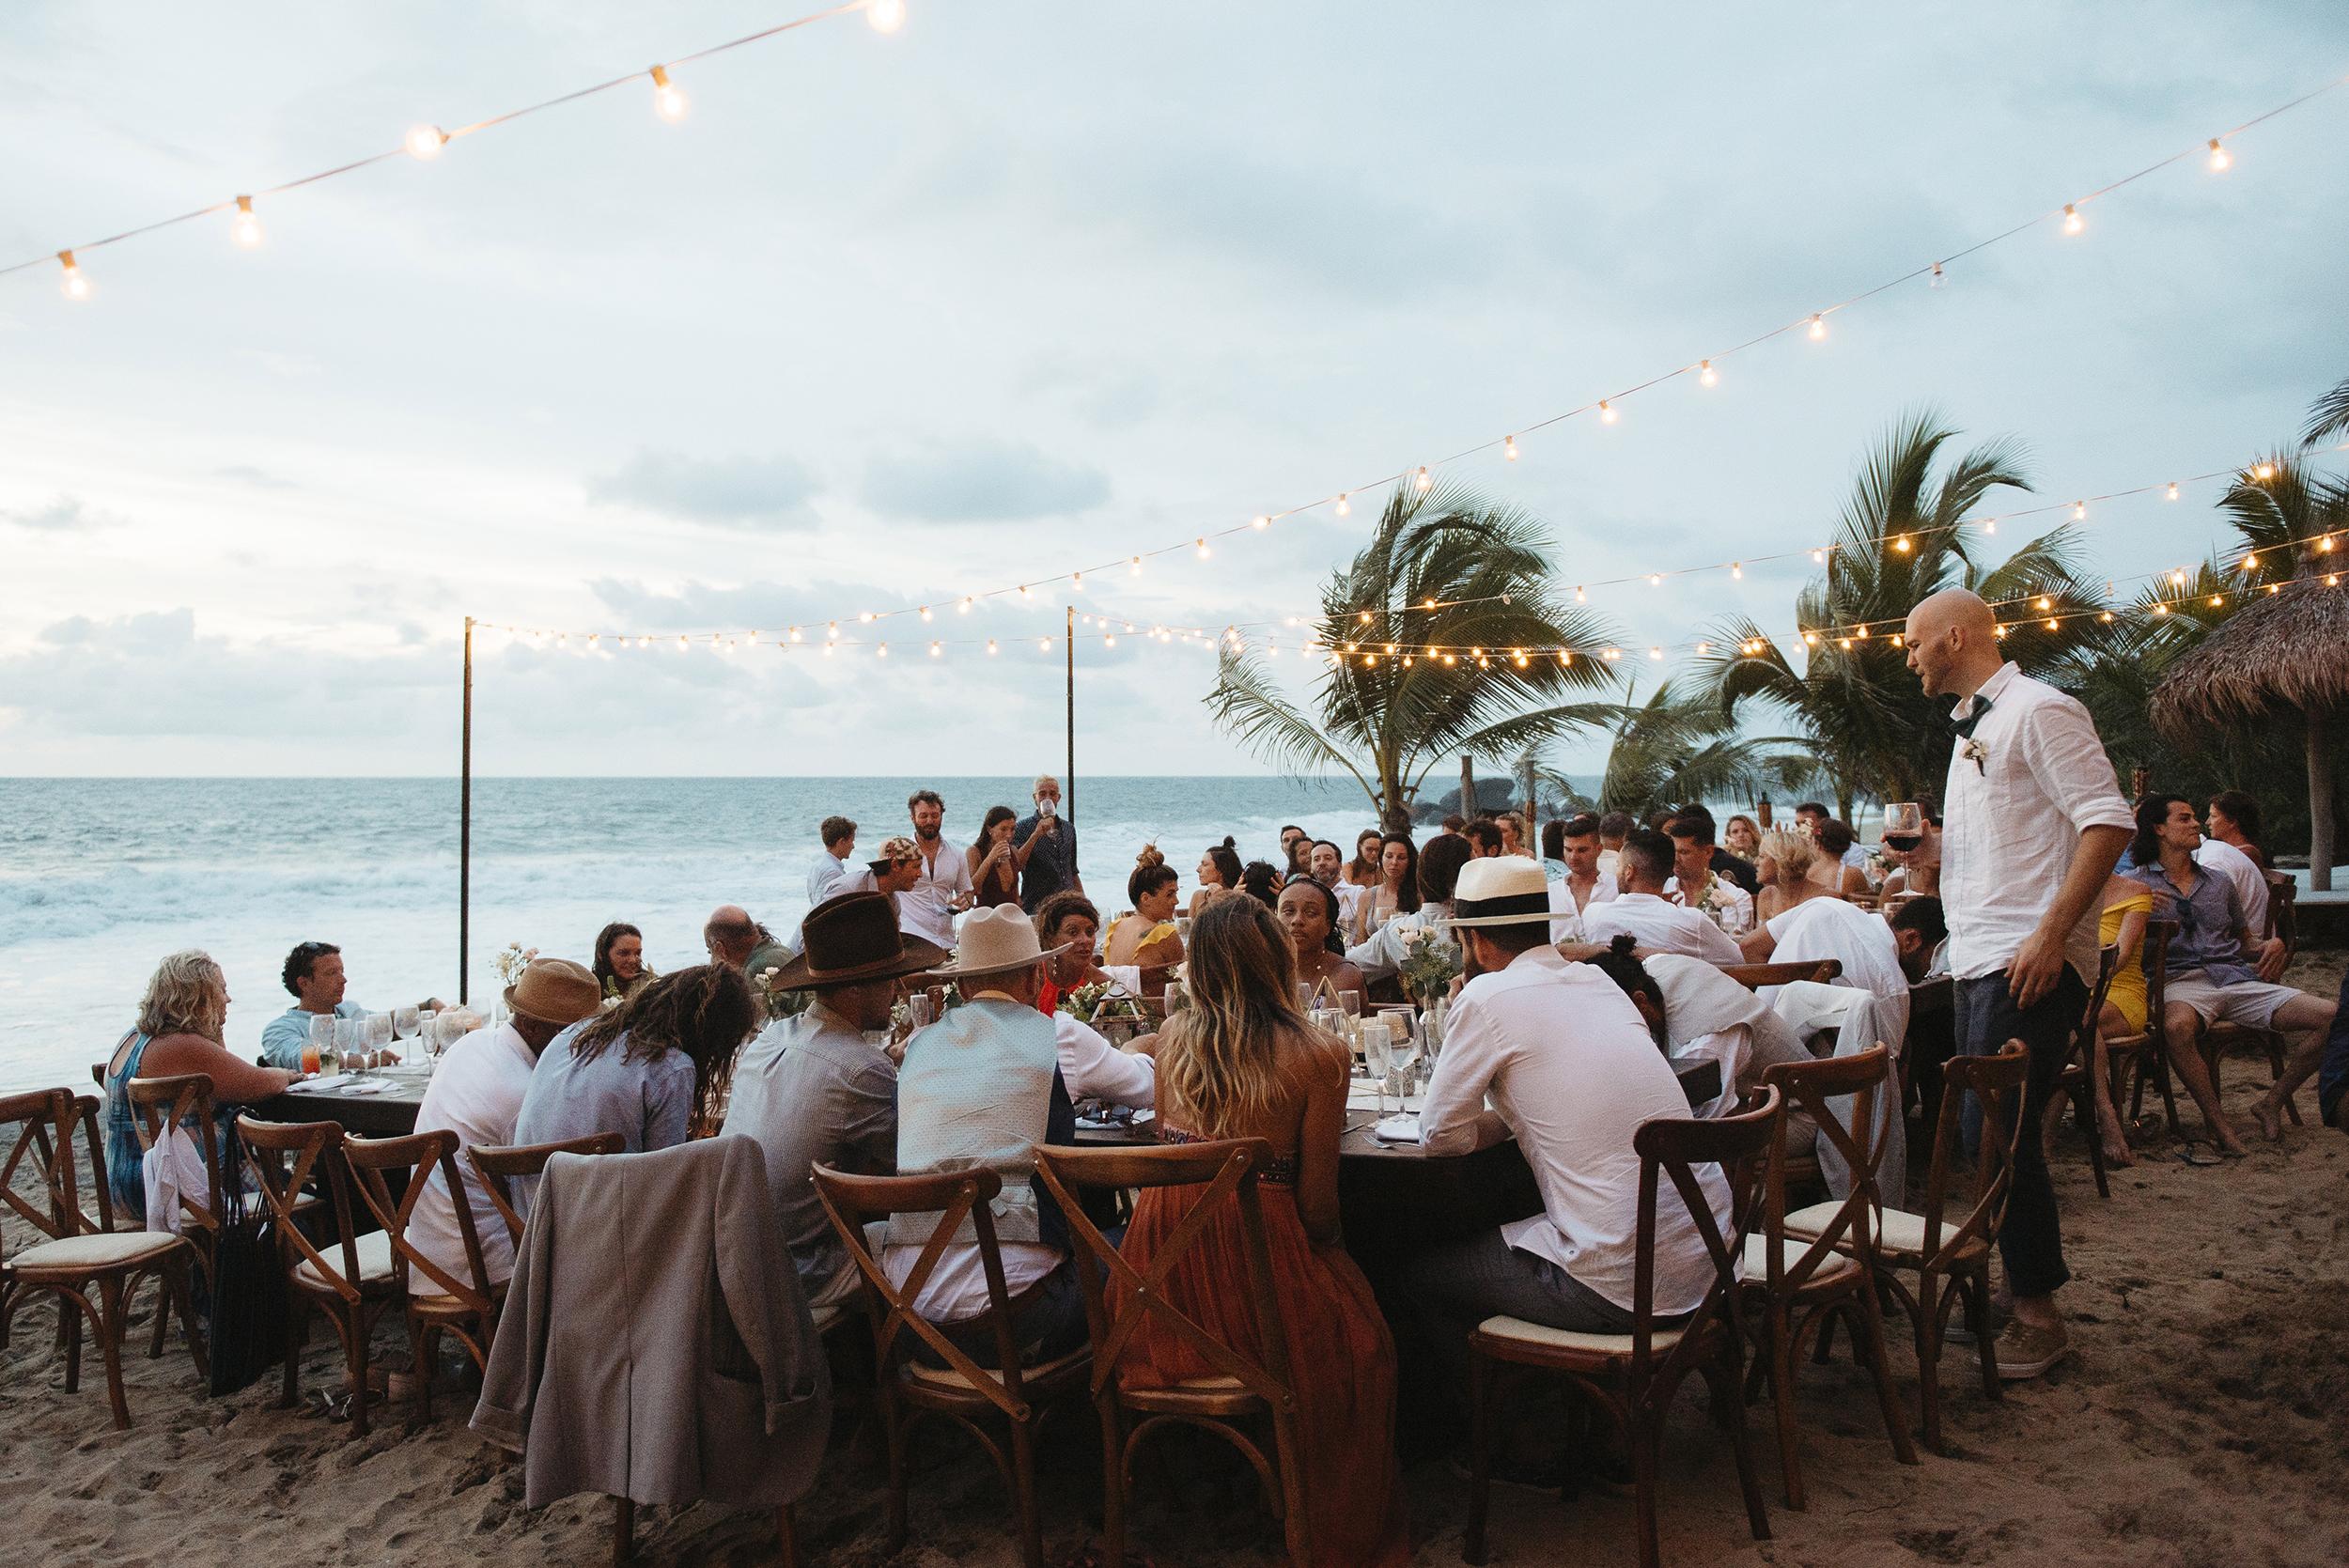 Colby-and-Jess-Intimate-Destination-Wedding-Sayulita-Puerto-Vallarta-Mexico708.jpg